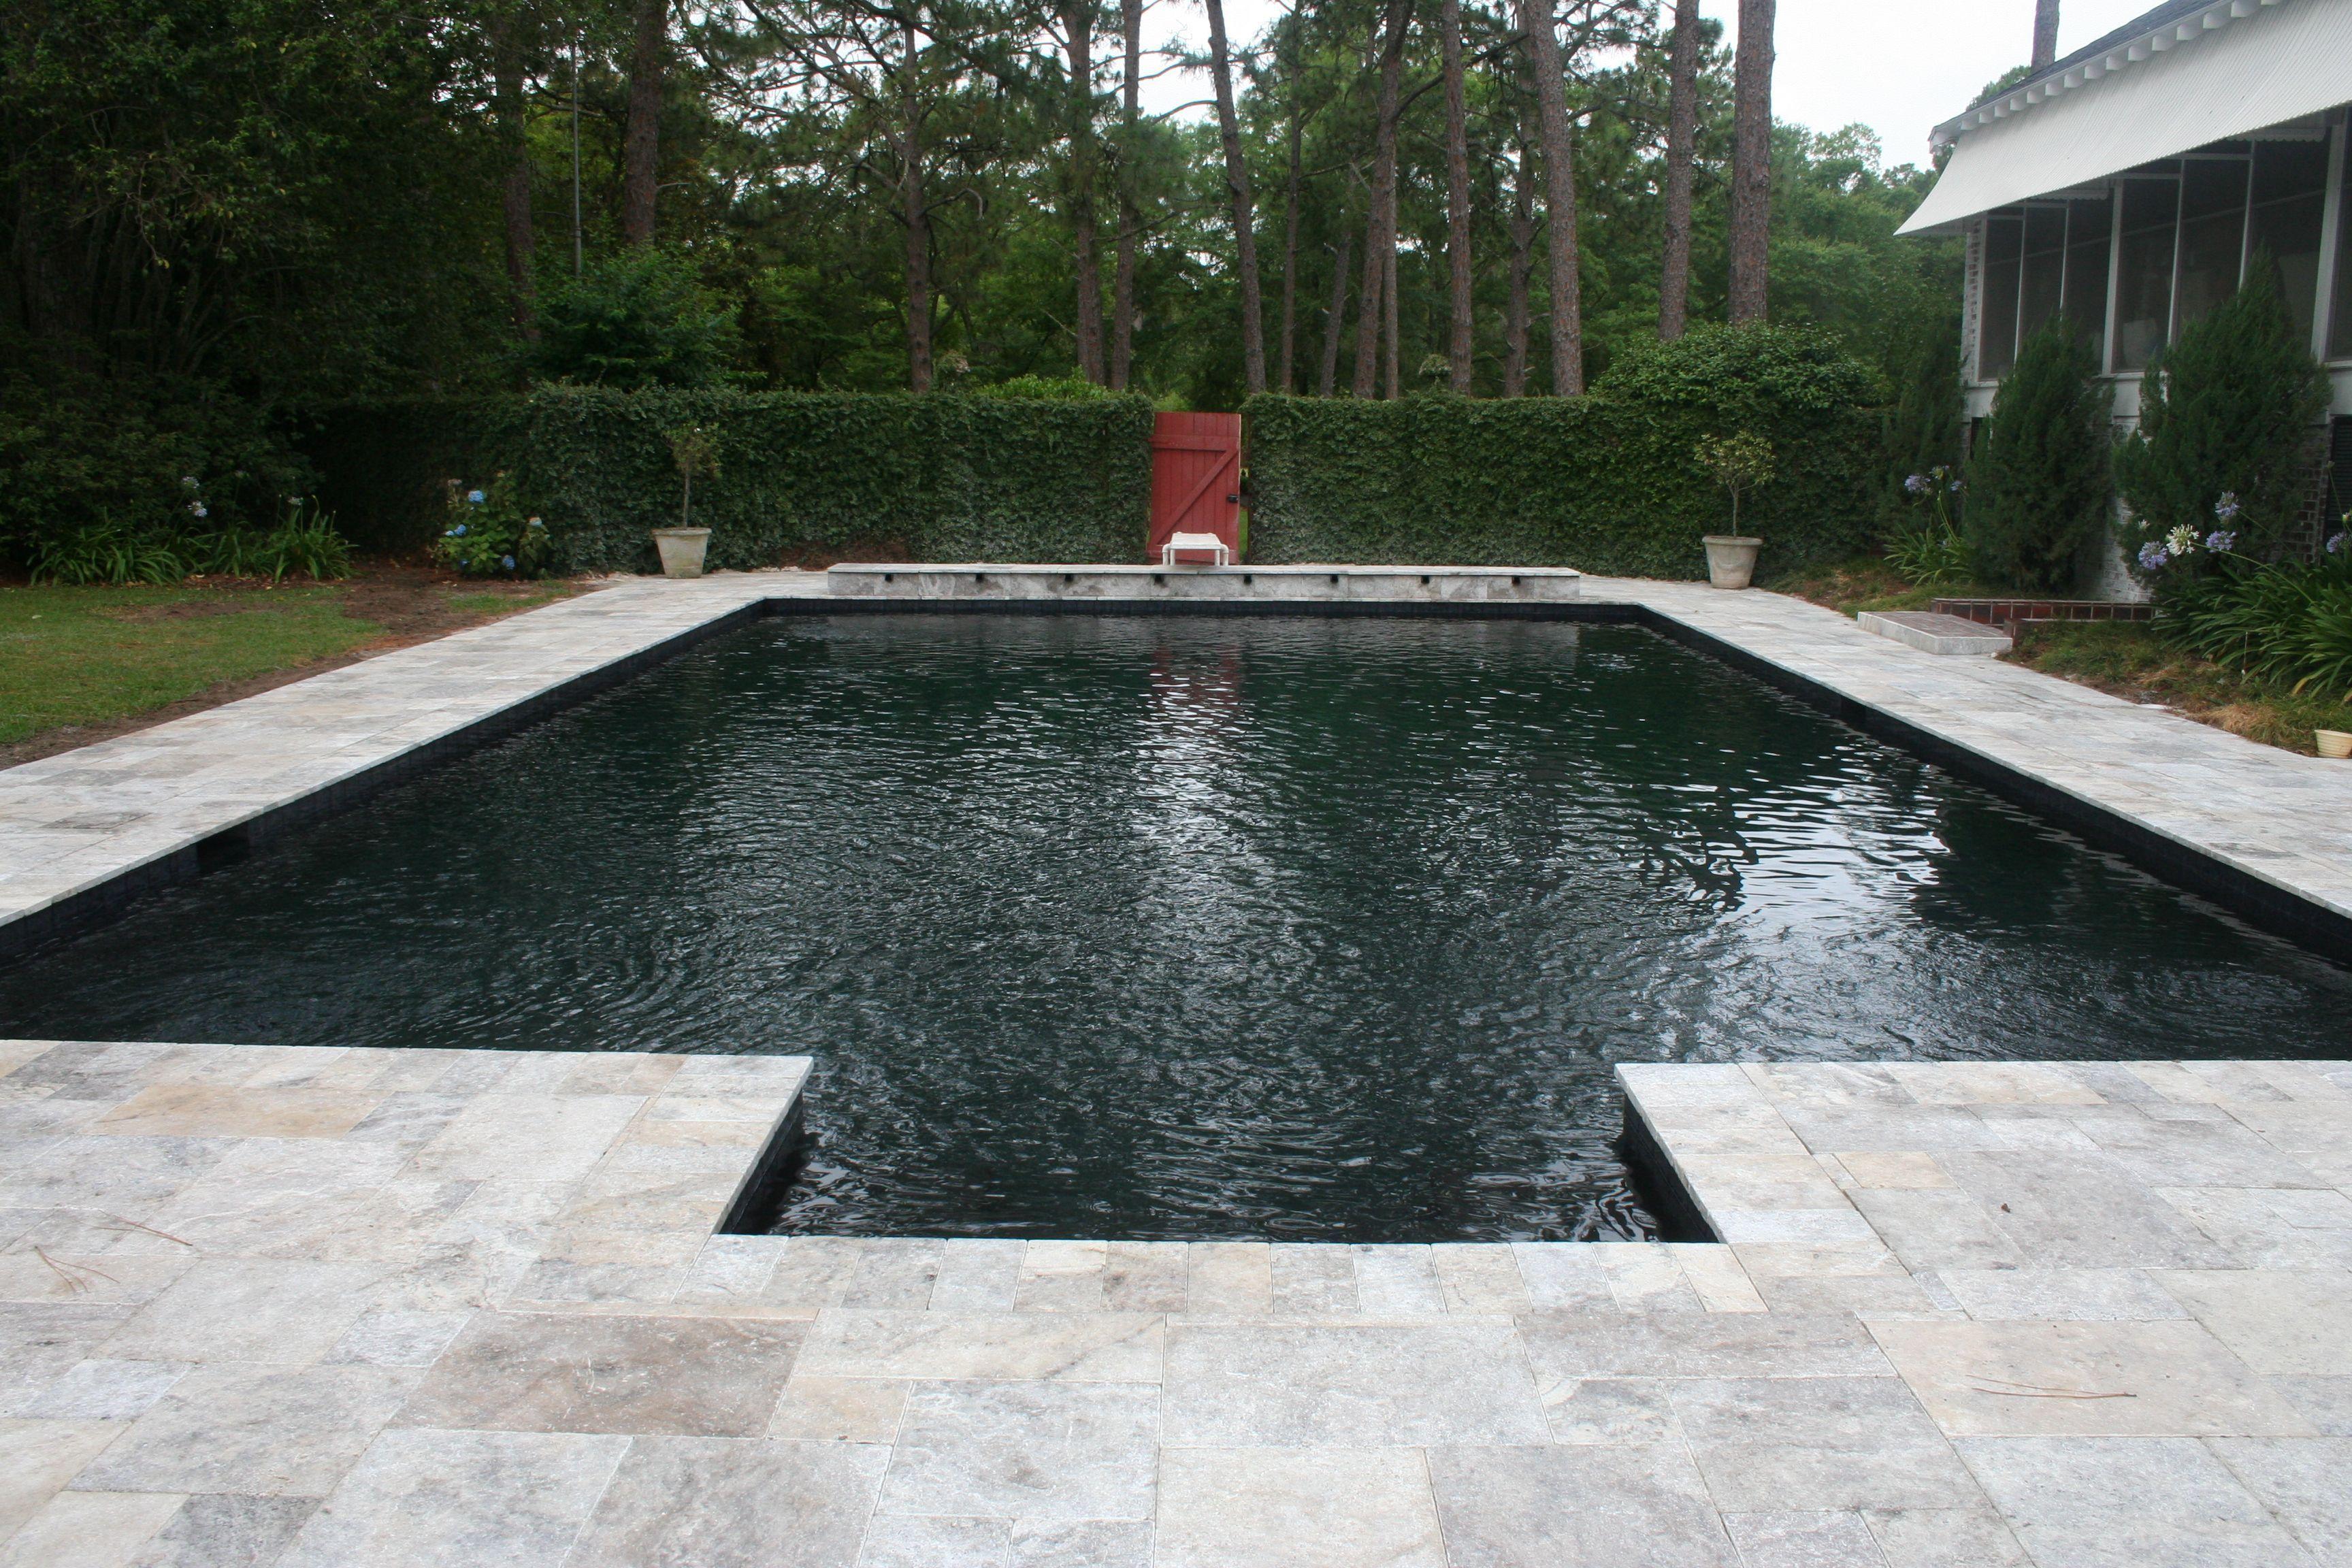 Silver Travertine Pool Deck Google Search Travertine Pool